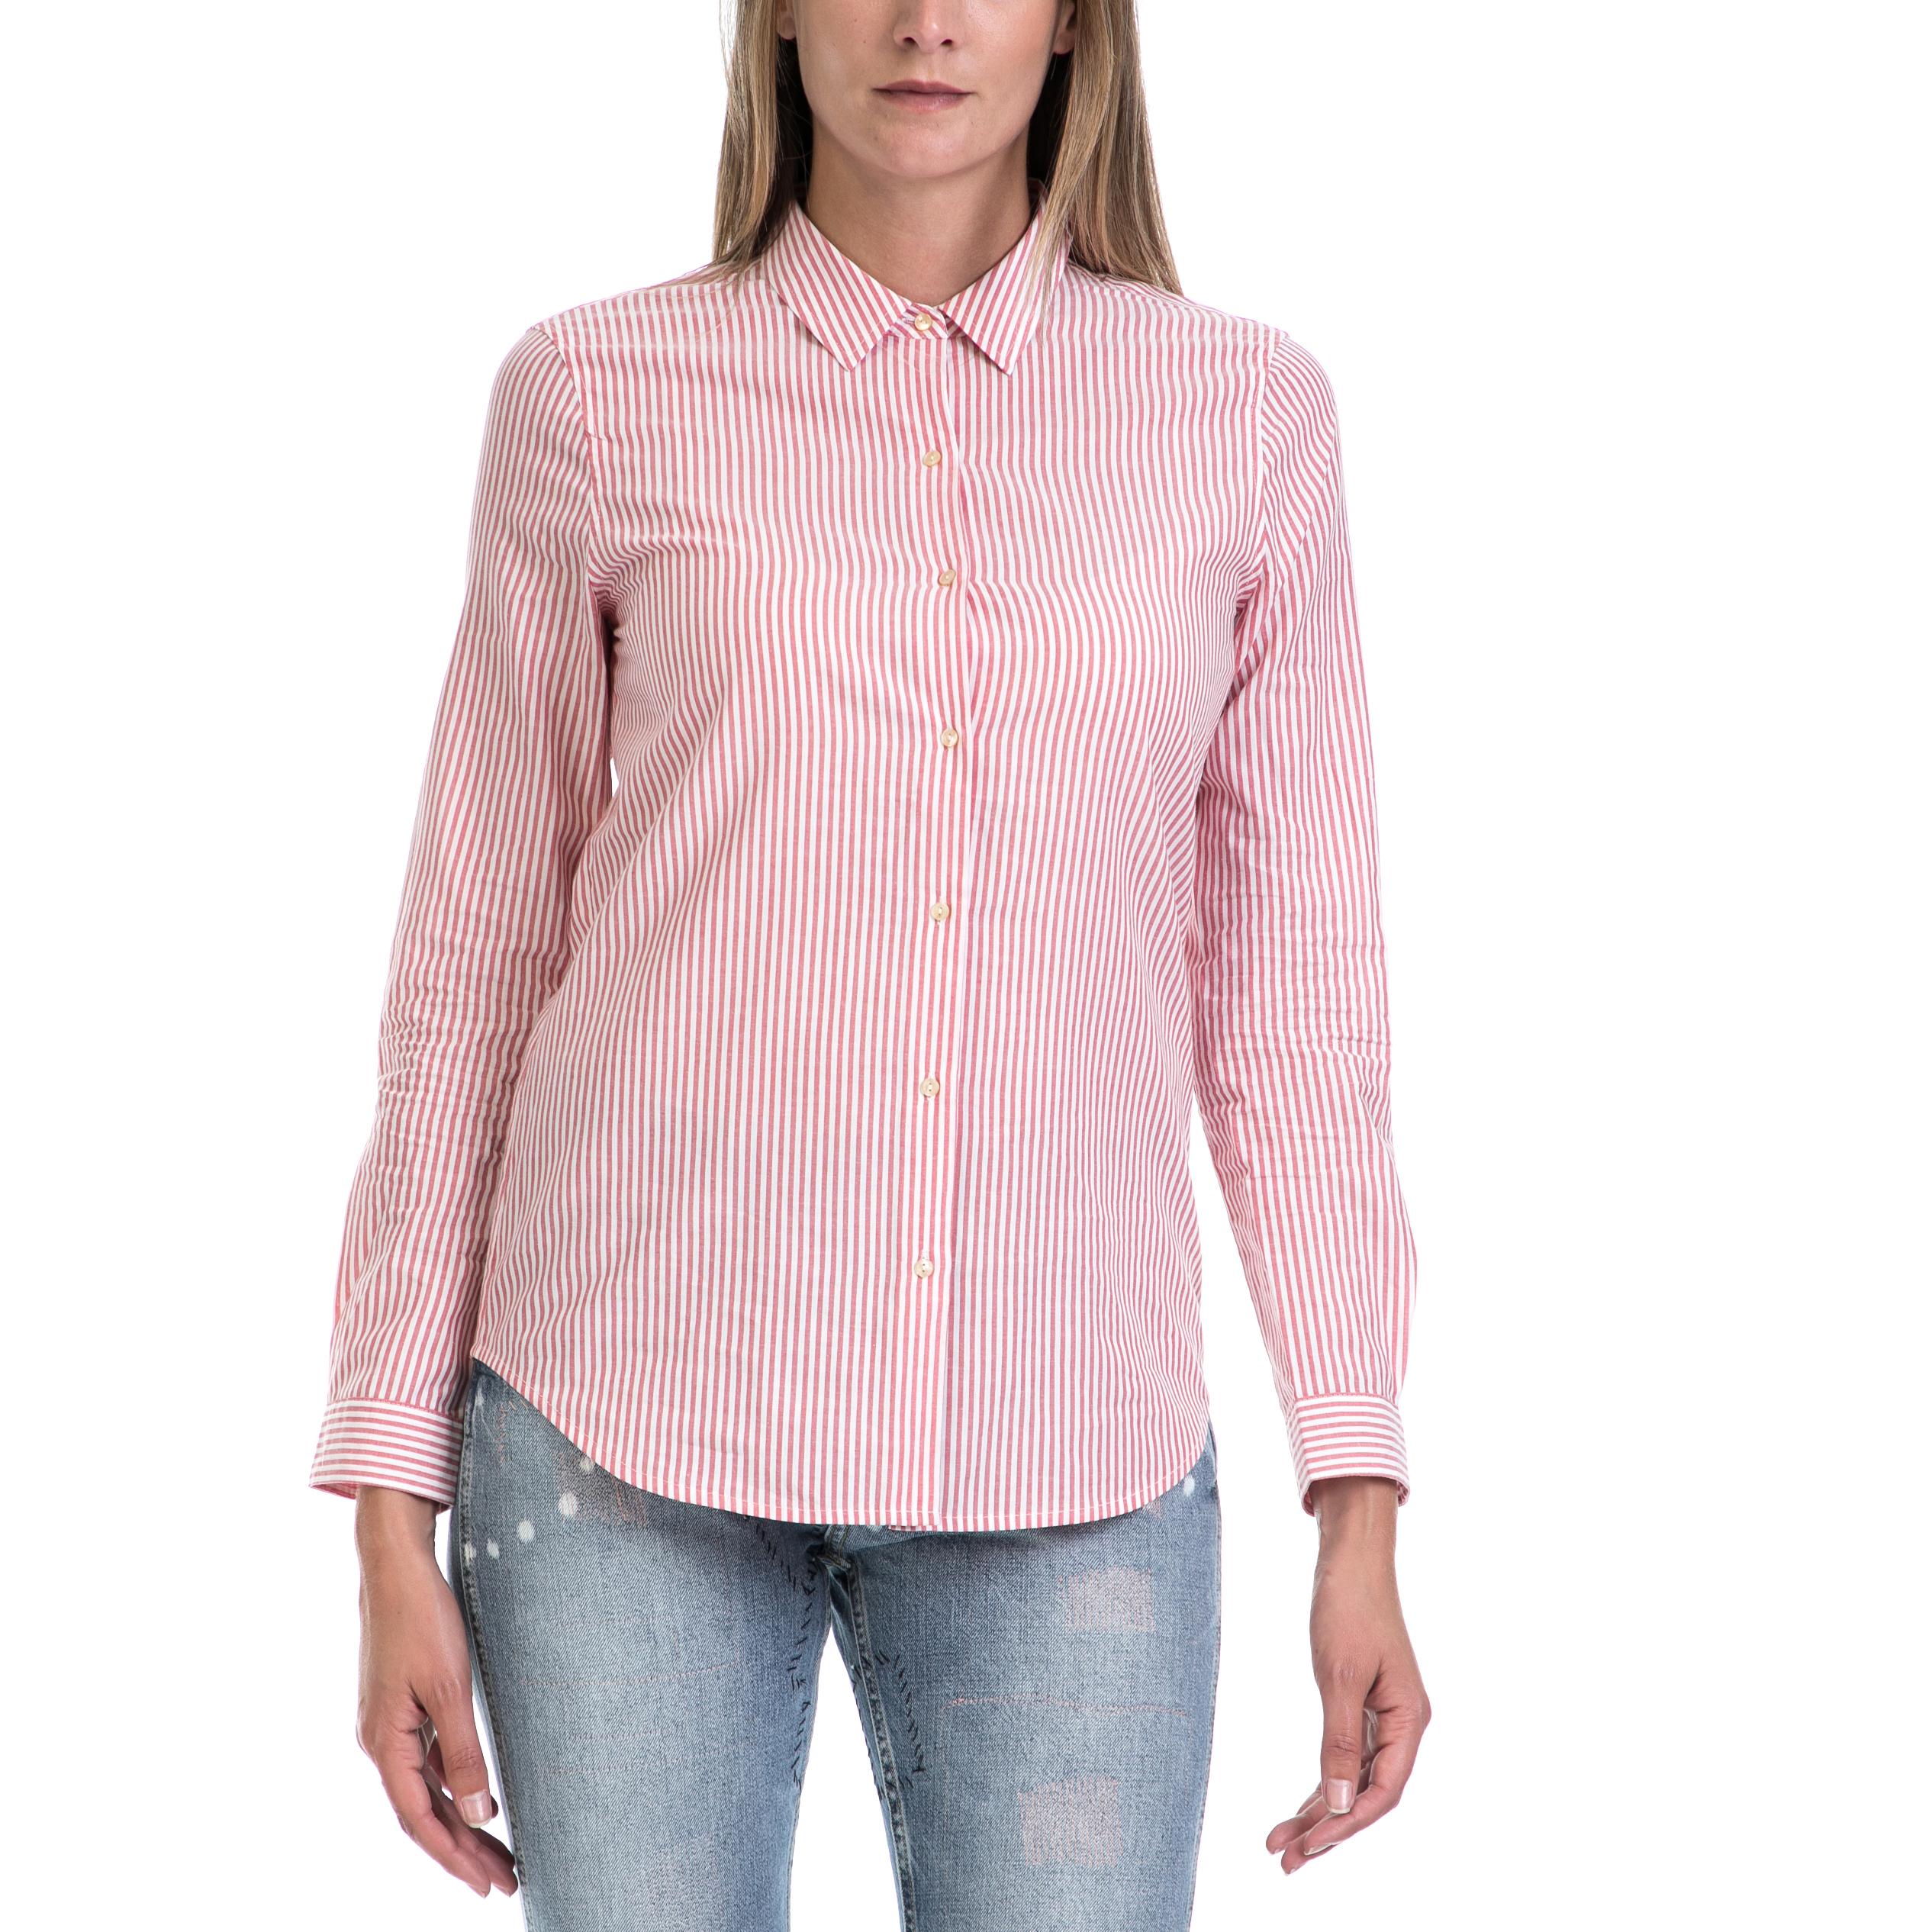 SCOTCH & SODA - Γυναικείο πουκάμισο MAISON SCOTCH κόκκινο-άσπρο γυναικεία ρούχα πουκάμισα μακρυμάνικα